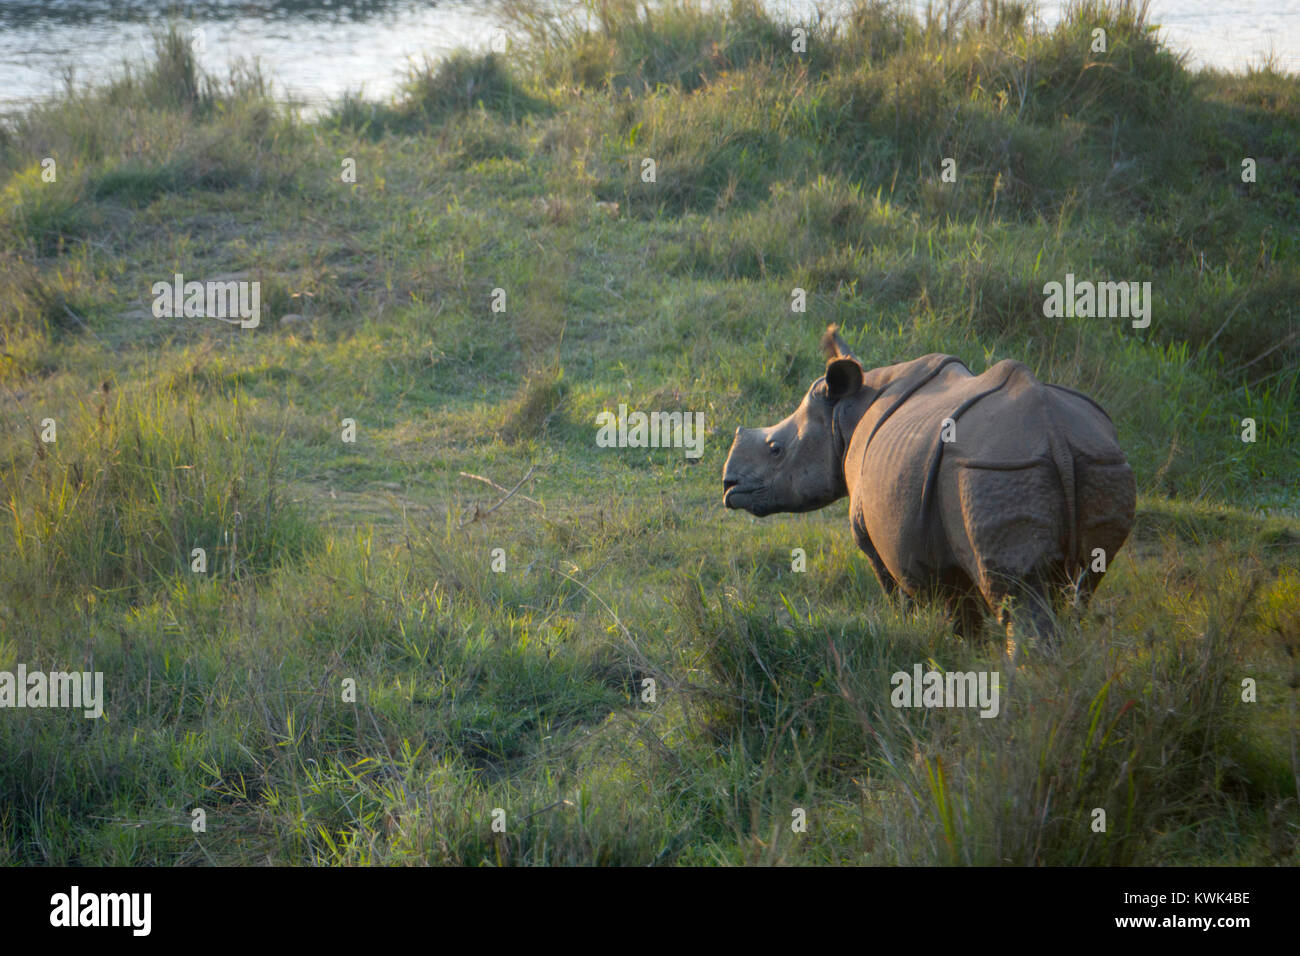 Juvenile greater one-horned rhino (Rhinoceros unicornis) in Chitwan national park, Nepal - Stock Image